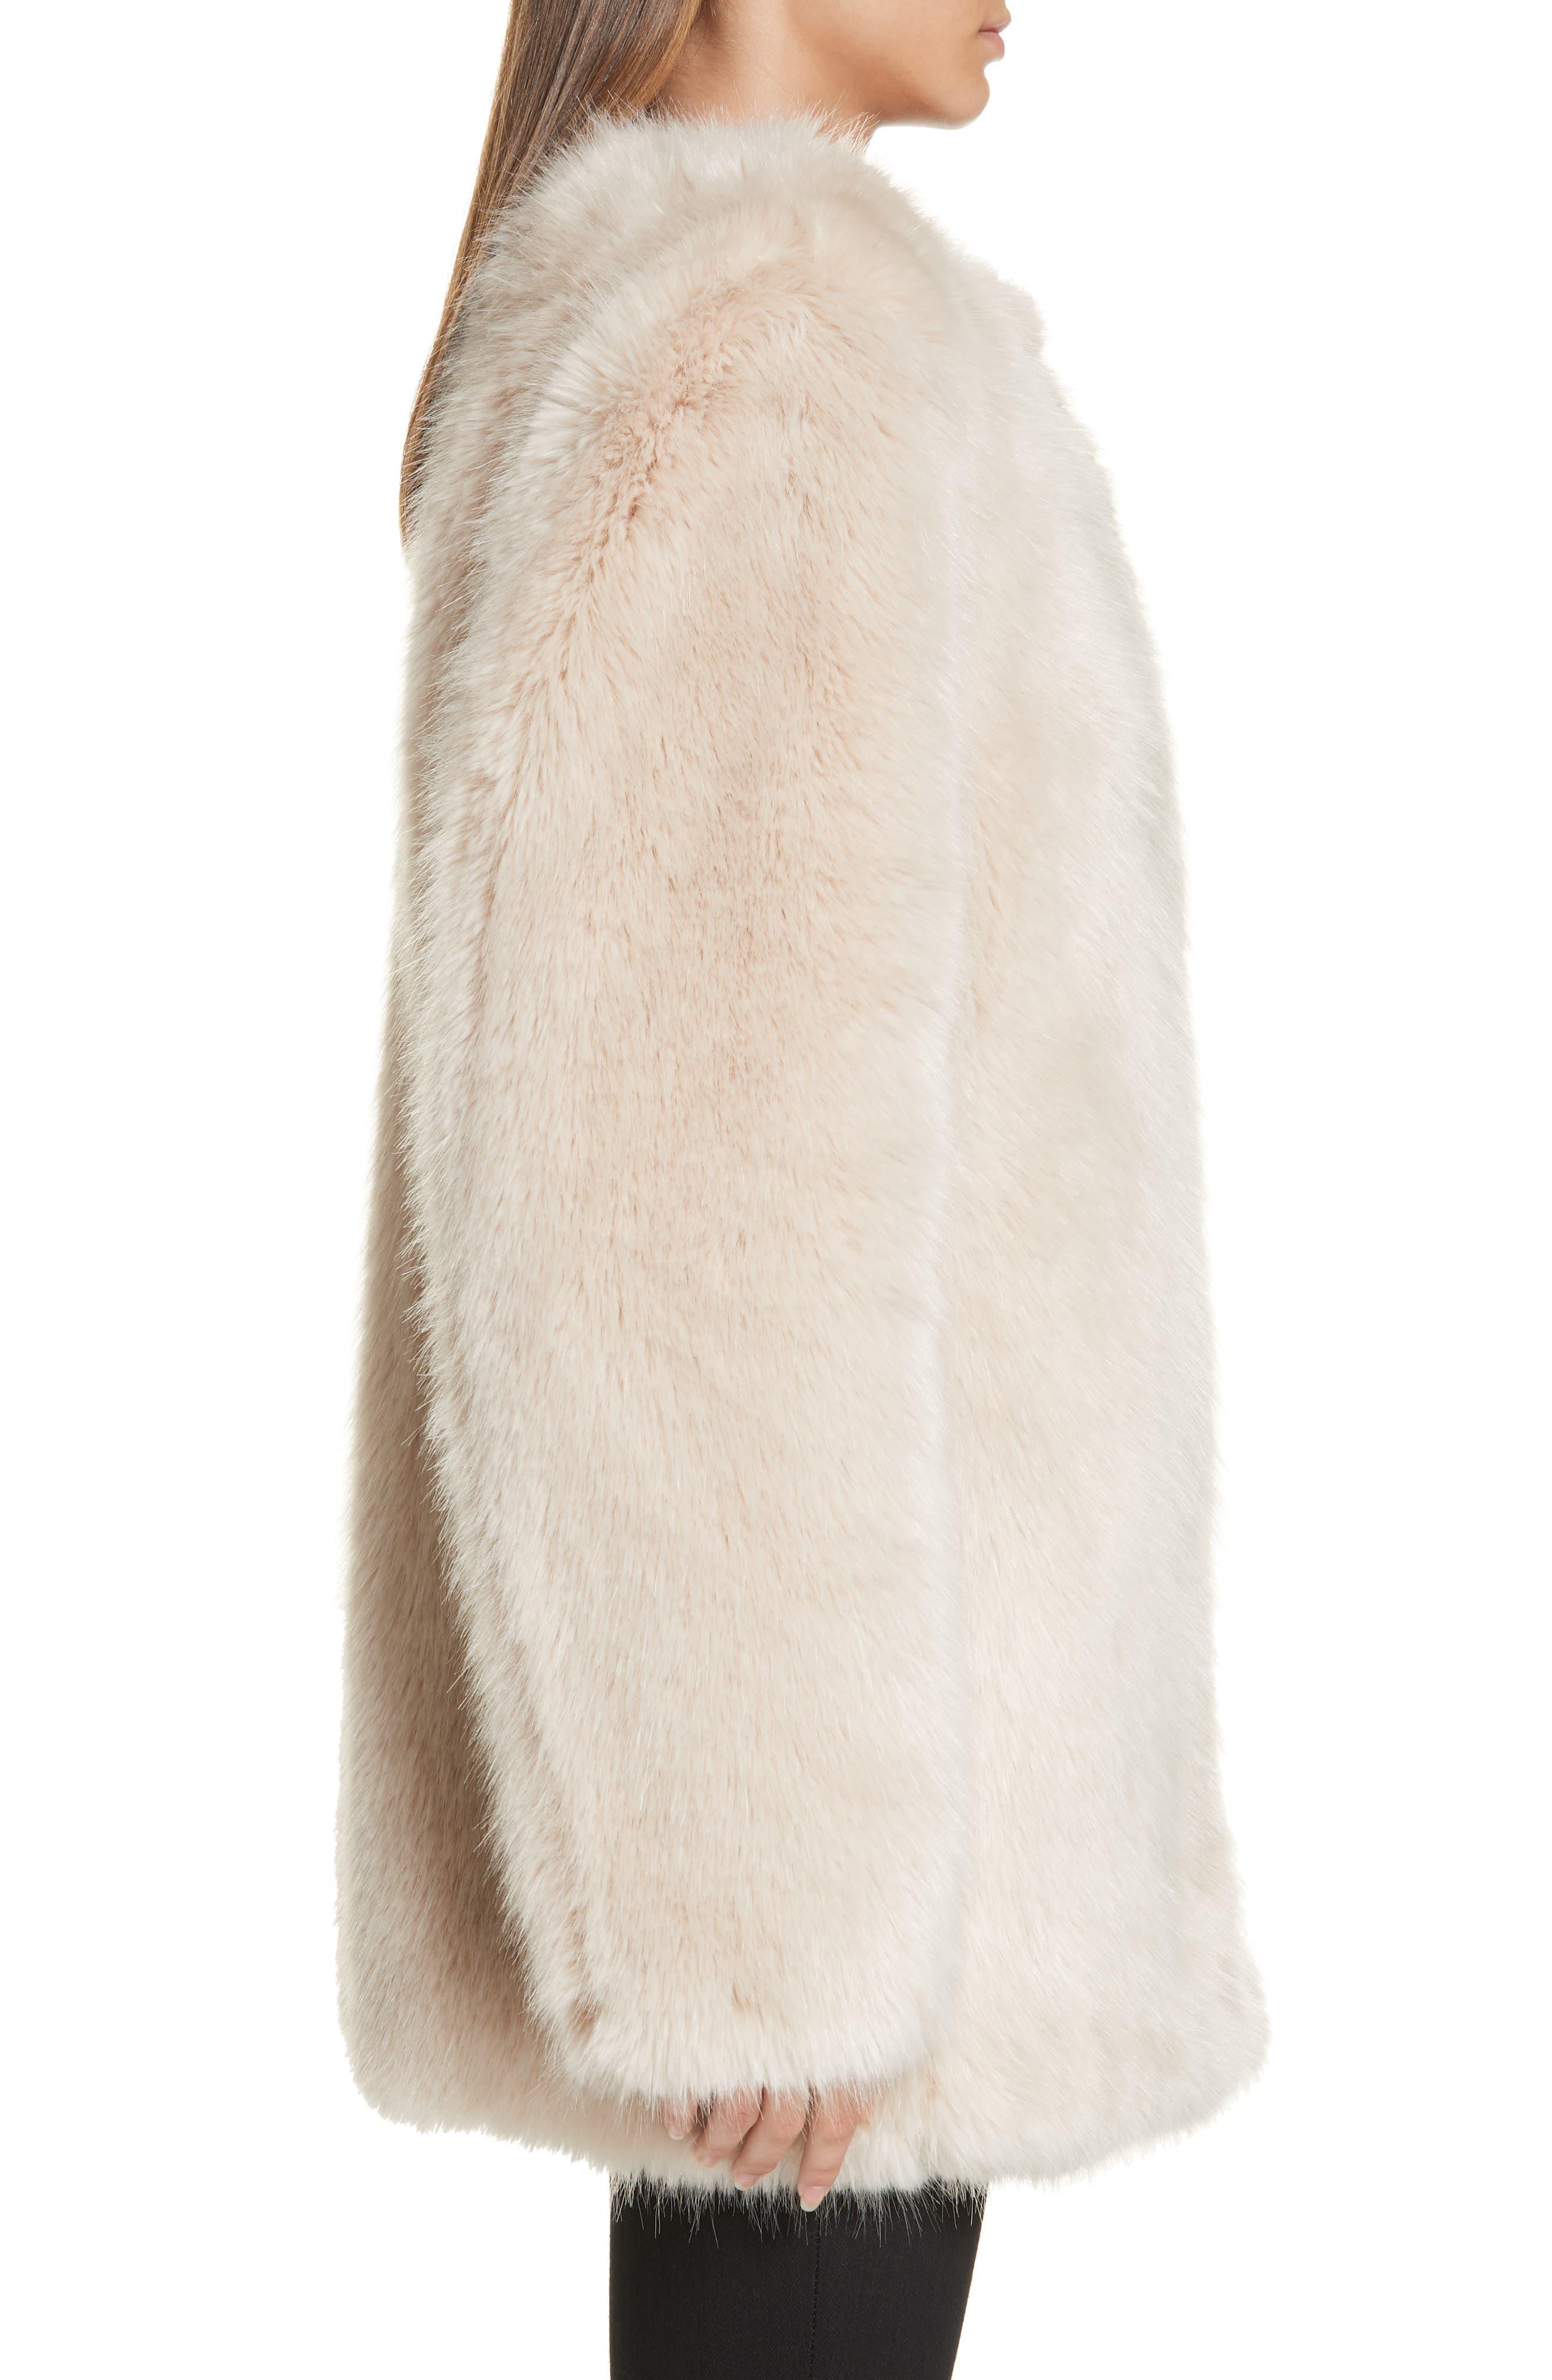 HELMUT LANG, Faux Fur Coat, Alternate thumbnail 4, color, OATMEAL